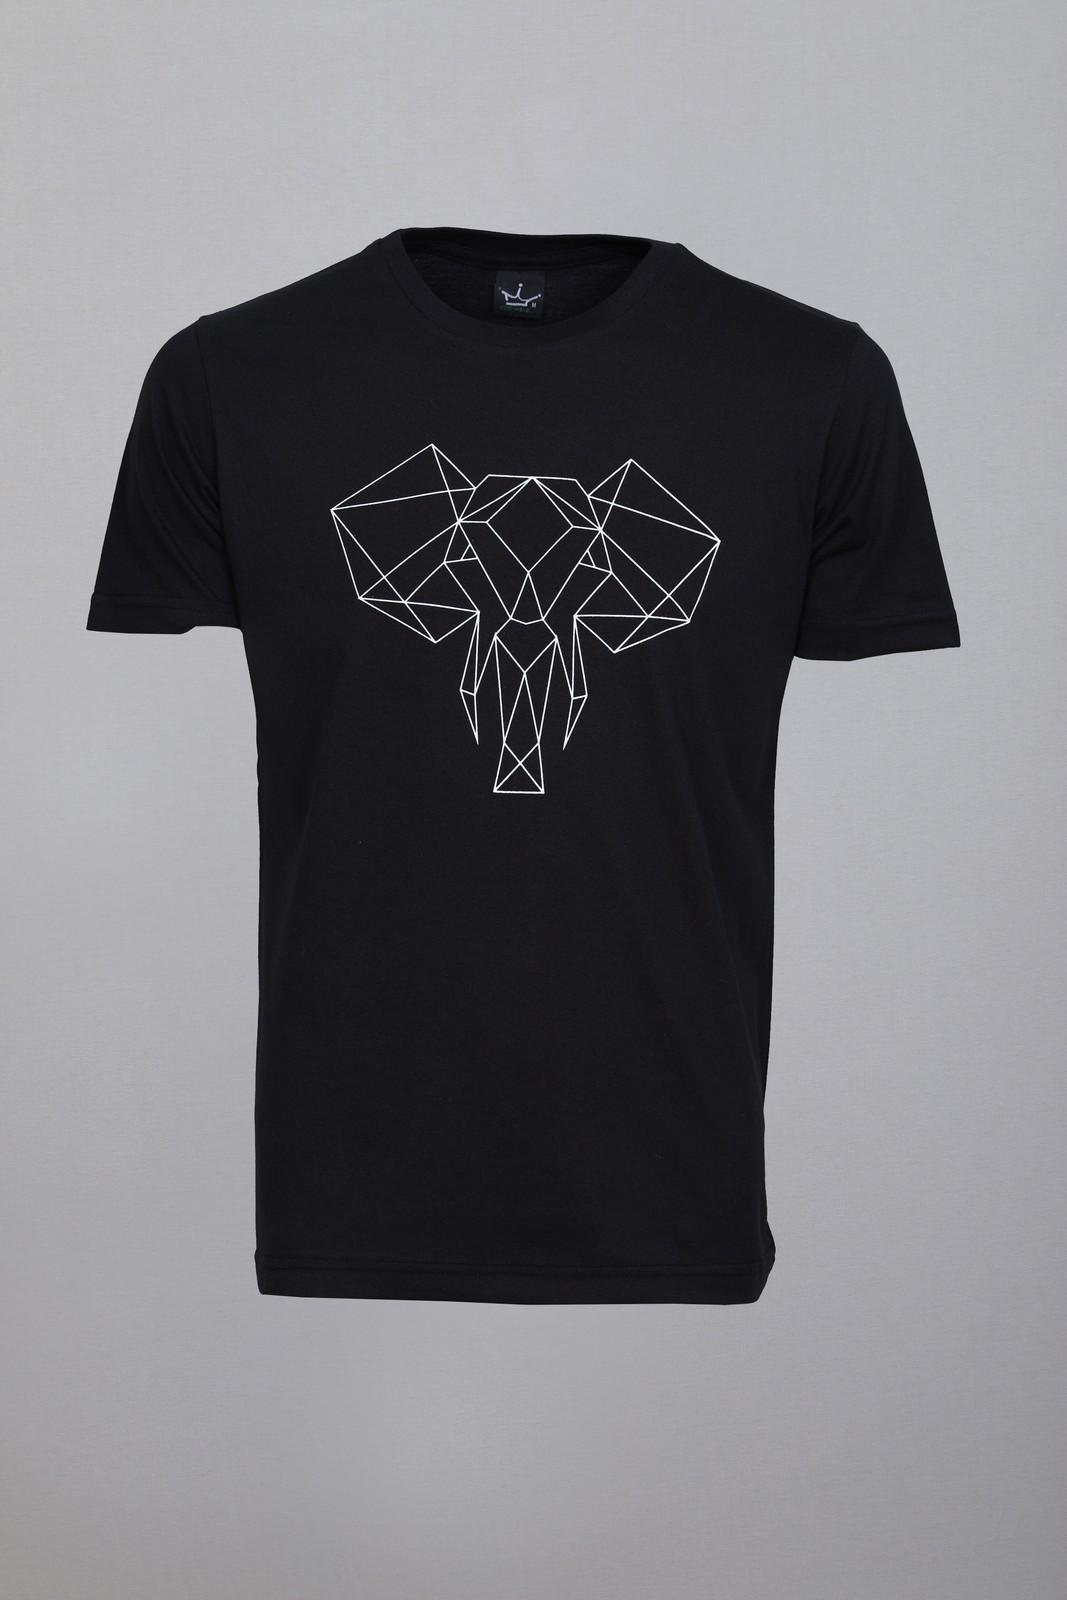 Camiseta CoolWave Elefante Preta